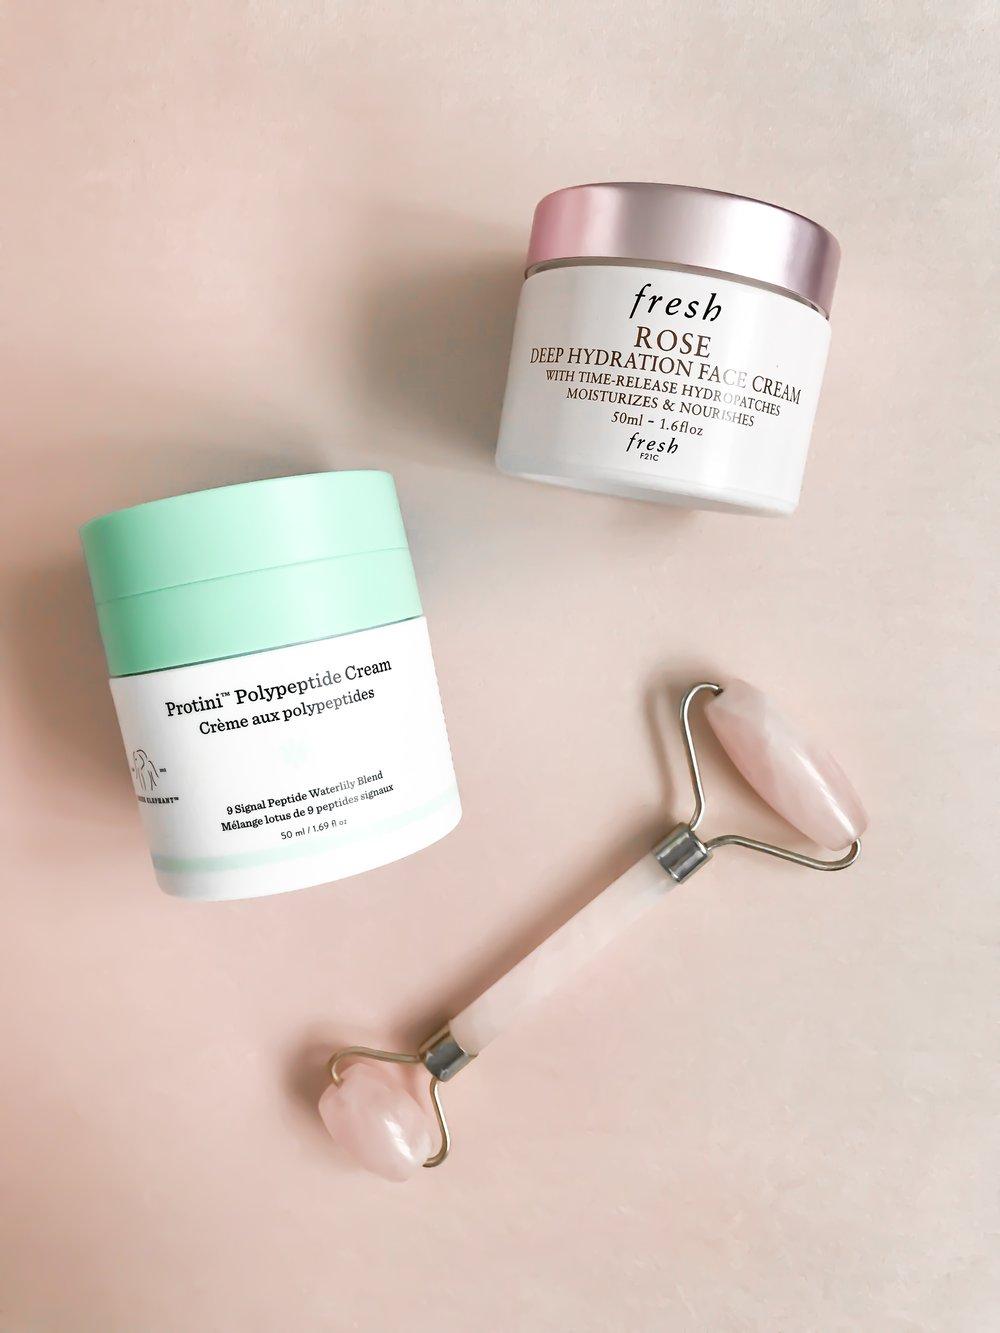 Spring Skincare Routine   Pine Barren Beauty   spring skincare, drunk elephant protini face cream, fresh rose moisturizer, rose quartz facial roller